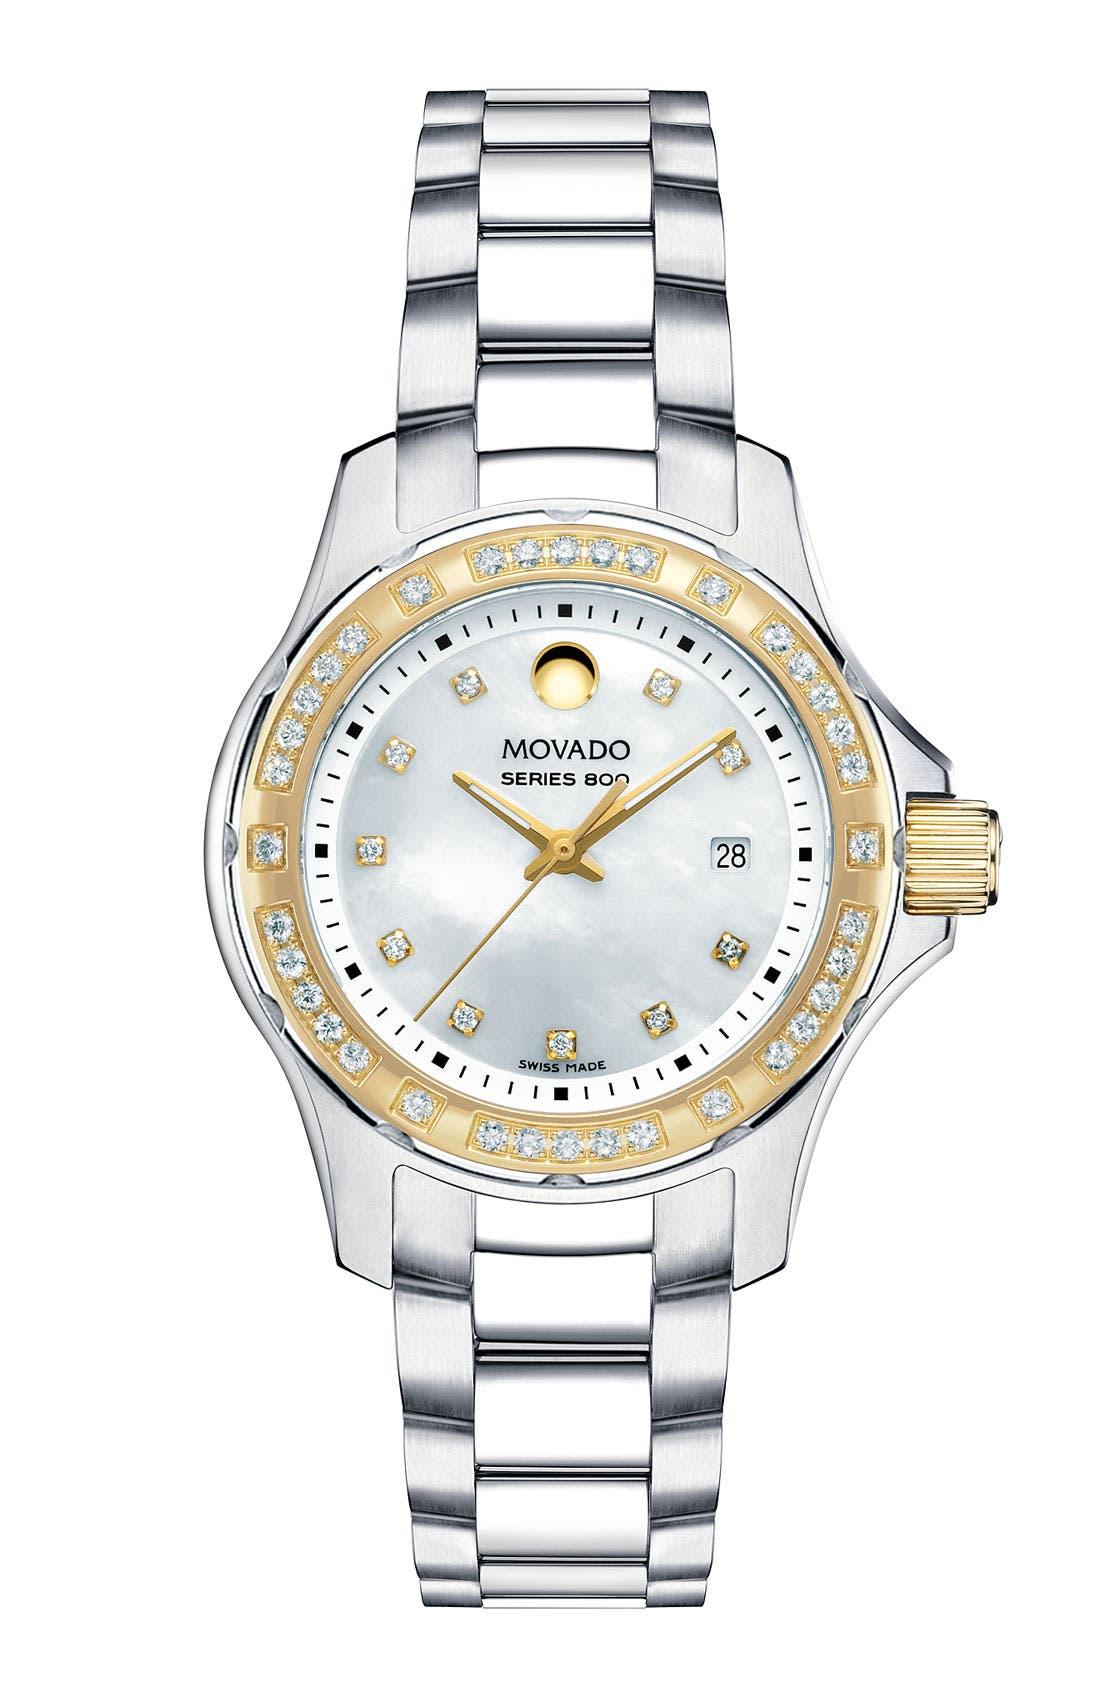 Alternate Image 1 Selected - Movado 'Series 800' Two Tone Diamond Bracelet Watch, 29mm